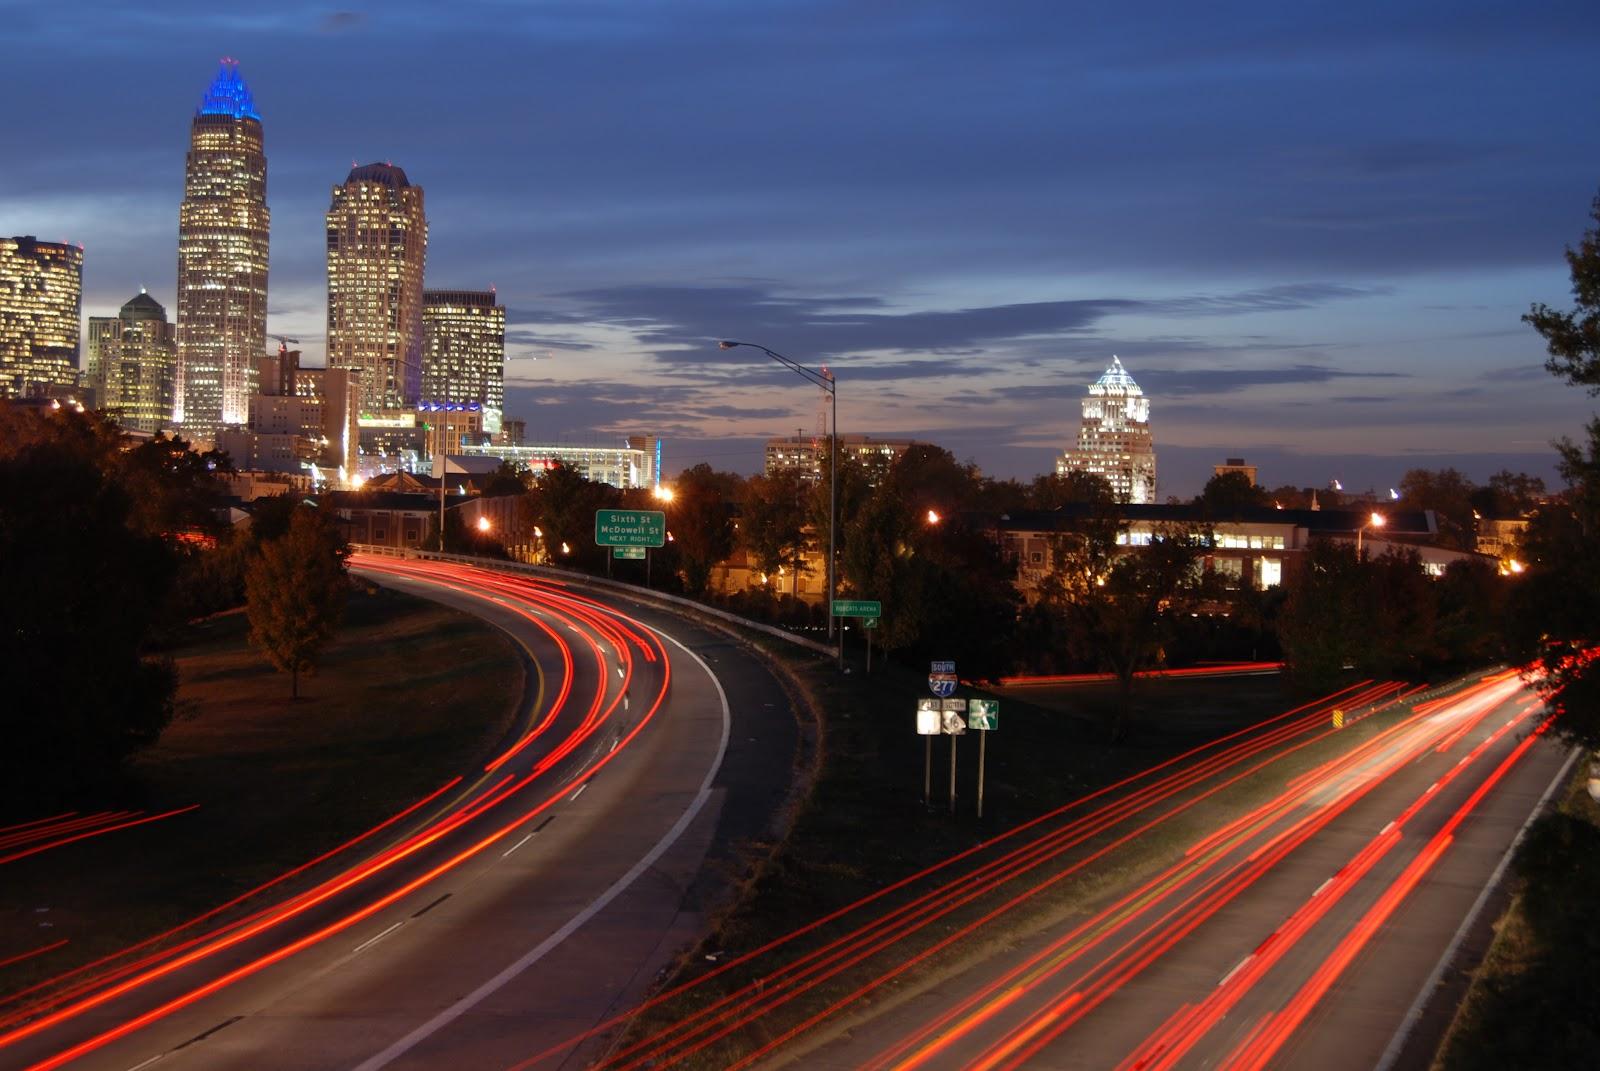 https://get.pxhere.com/photo/sunset-road-bridge-skyline-traffic-night-morning-highway-city-skyscraper-urban-cityscape-downtown-dusk-evening-twilight-landmark-charlotte-infrastructure-metropolis-north-carolina-car-trails-urban-area-human-settlement-metropolitan-area-502629.jpg